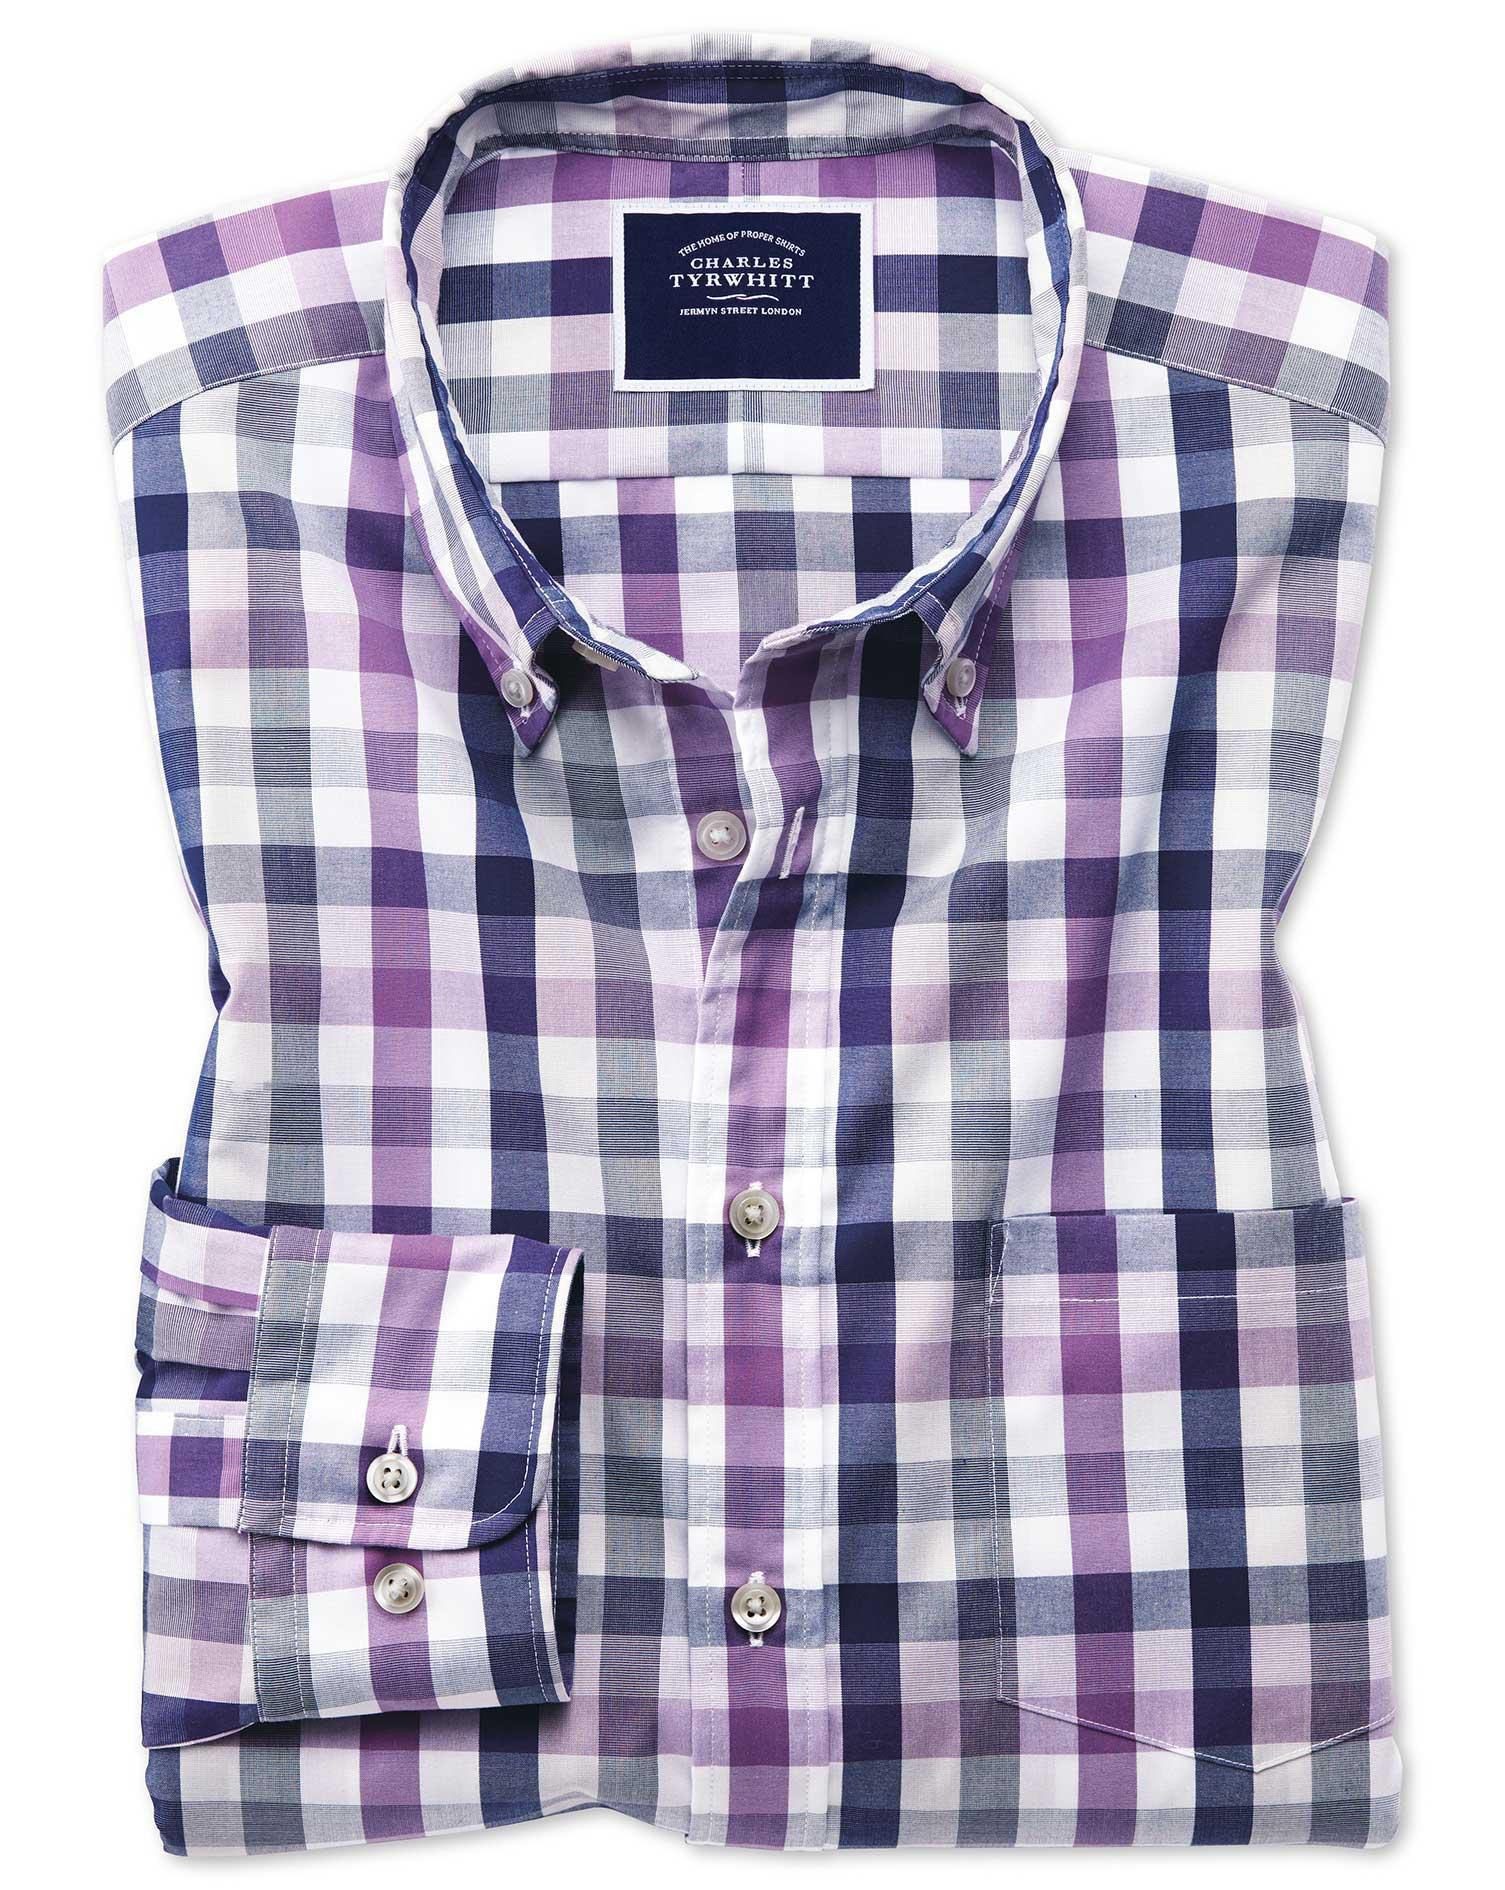 Cotton Slim Fit Purple Multi Check Soft Washed Non-Iron Tyrwhitt Cool Shirt